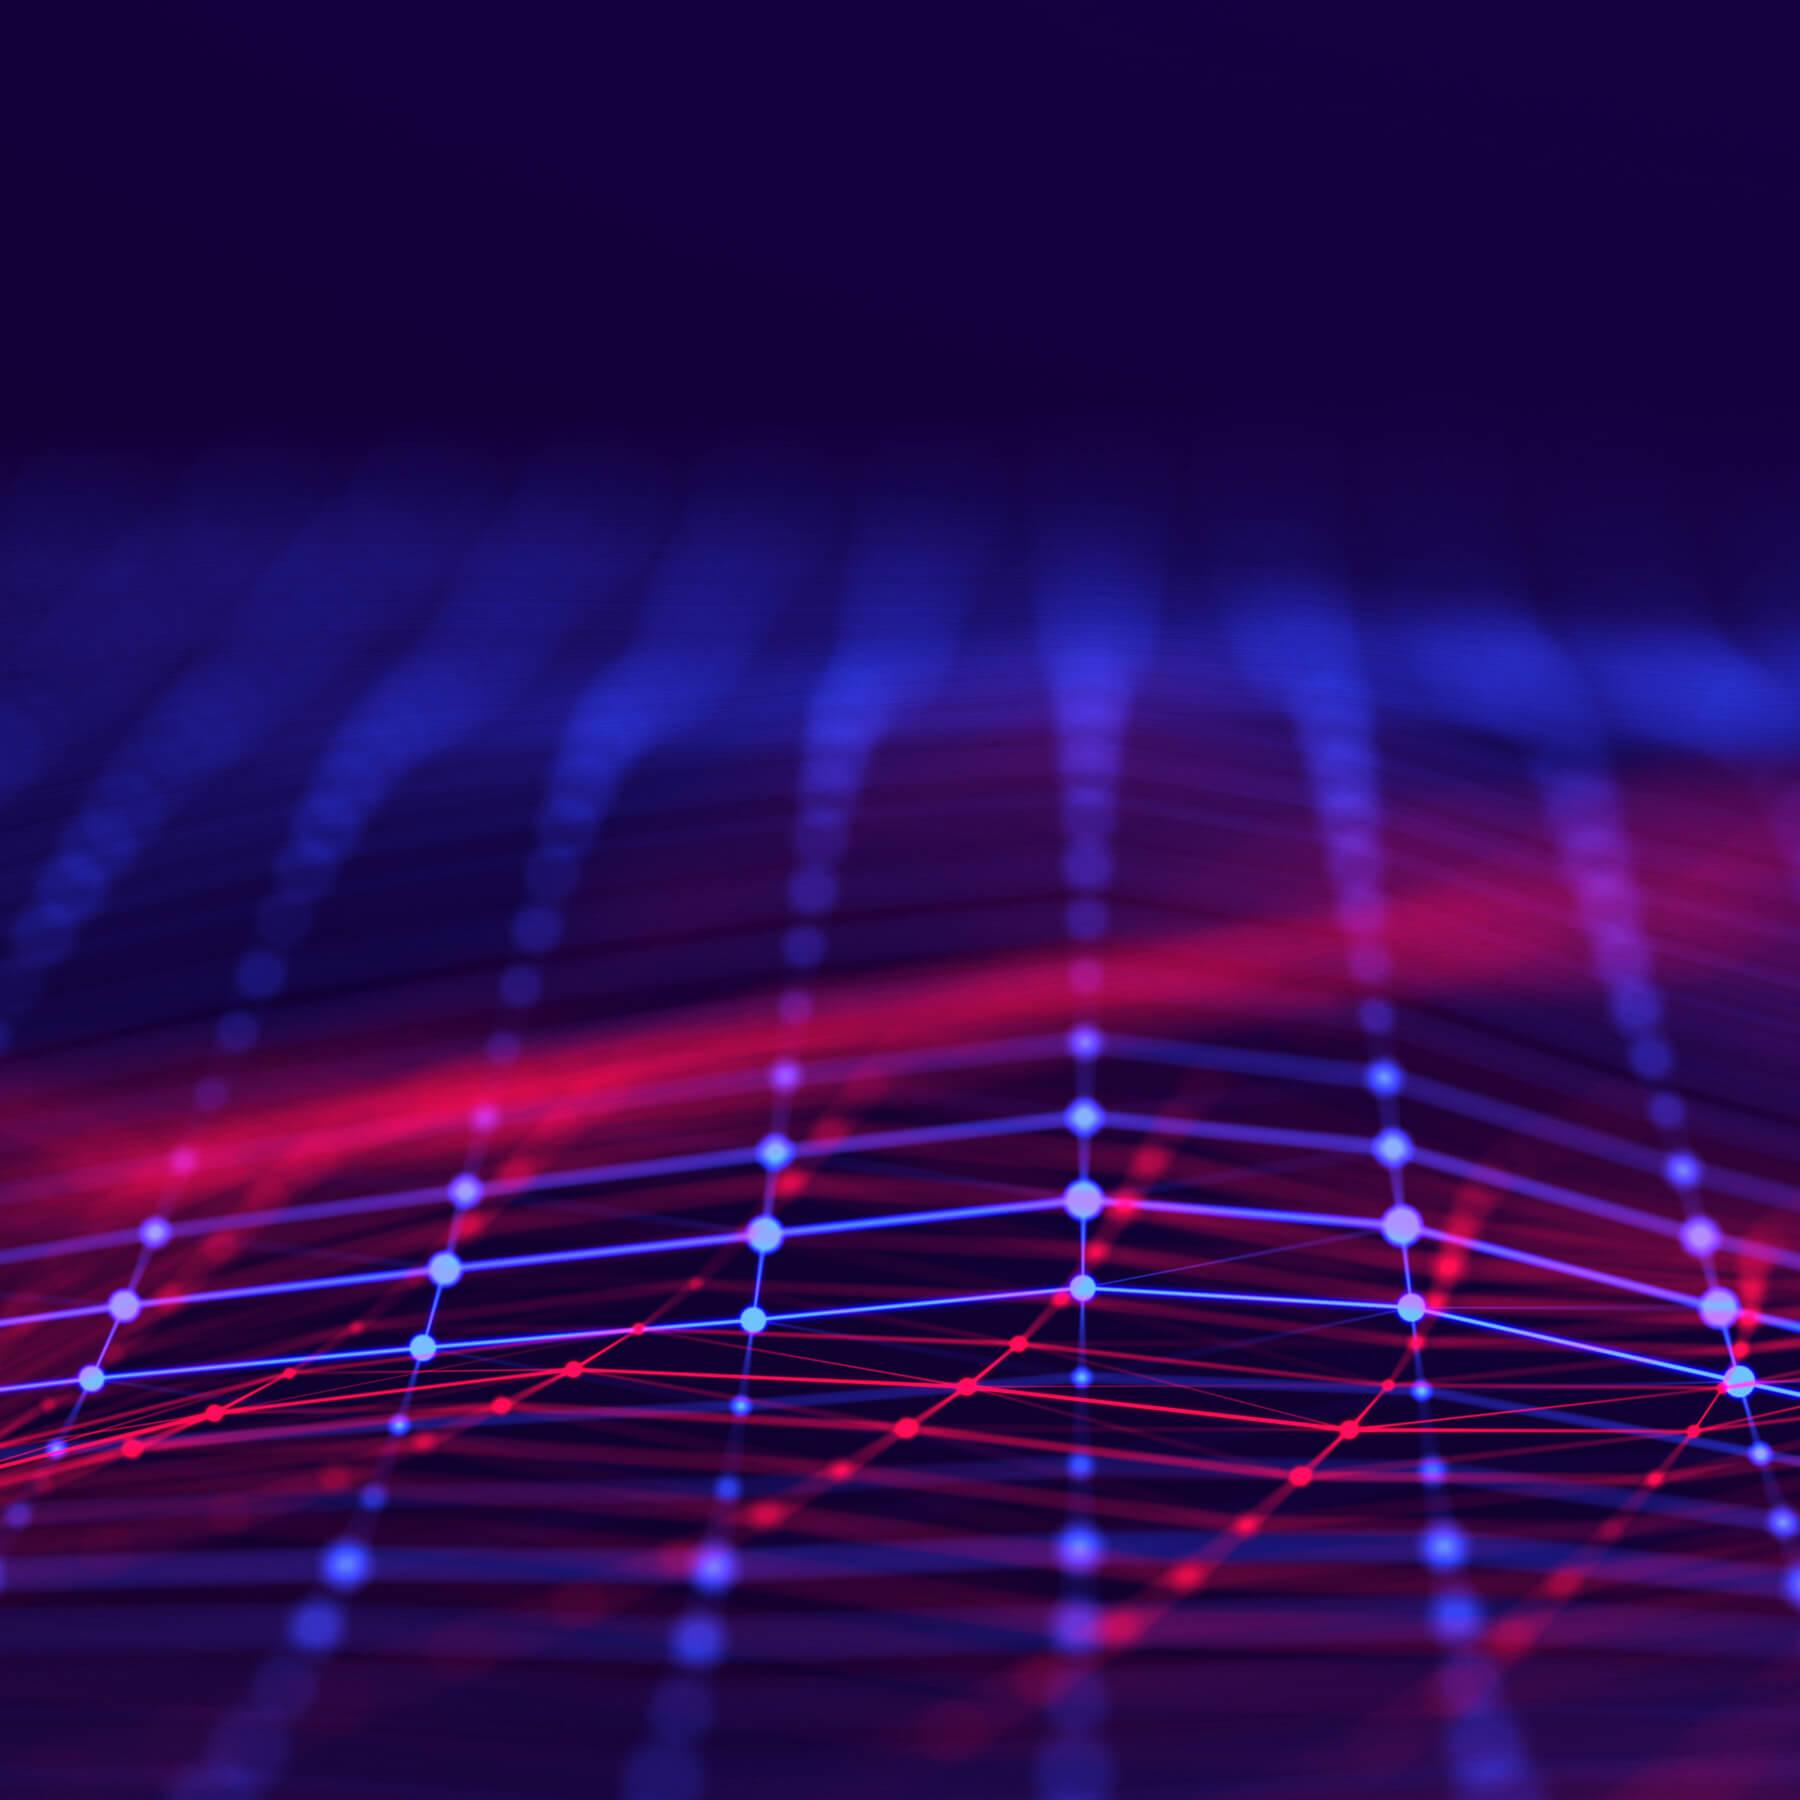 digital representation of a network grid